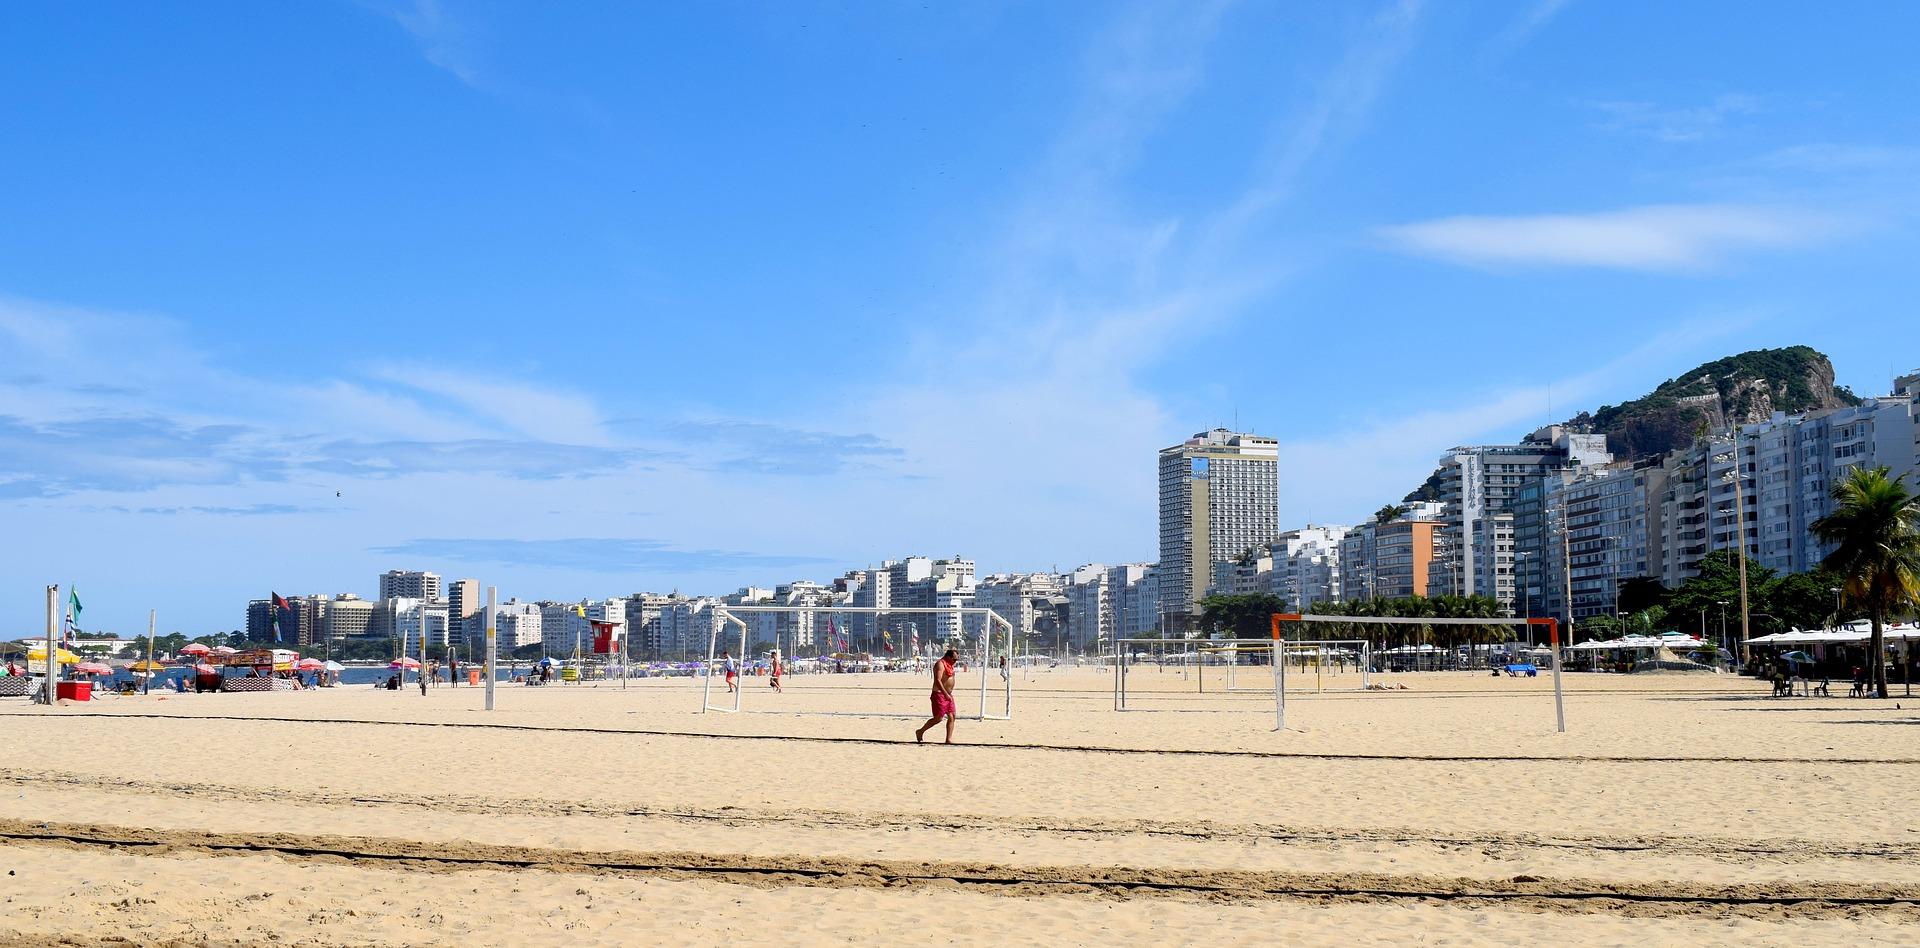 copacabana 4183795 1920